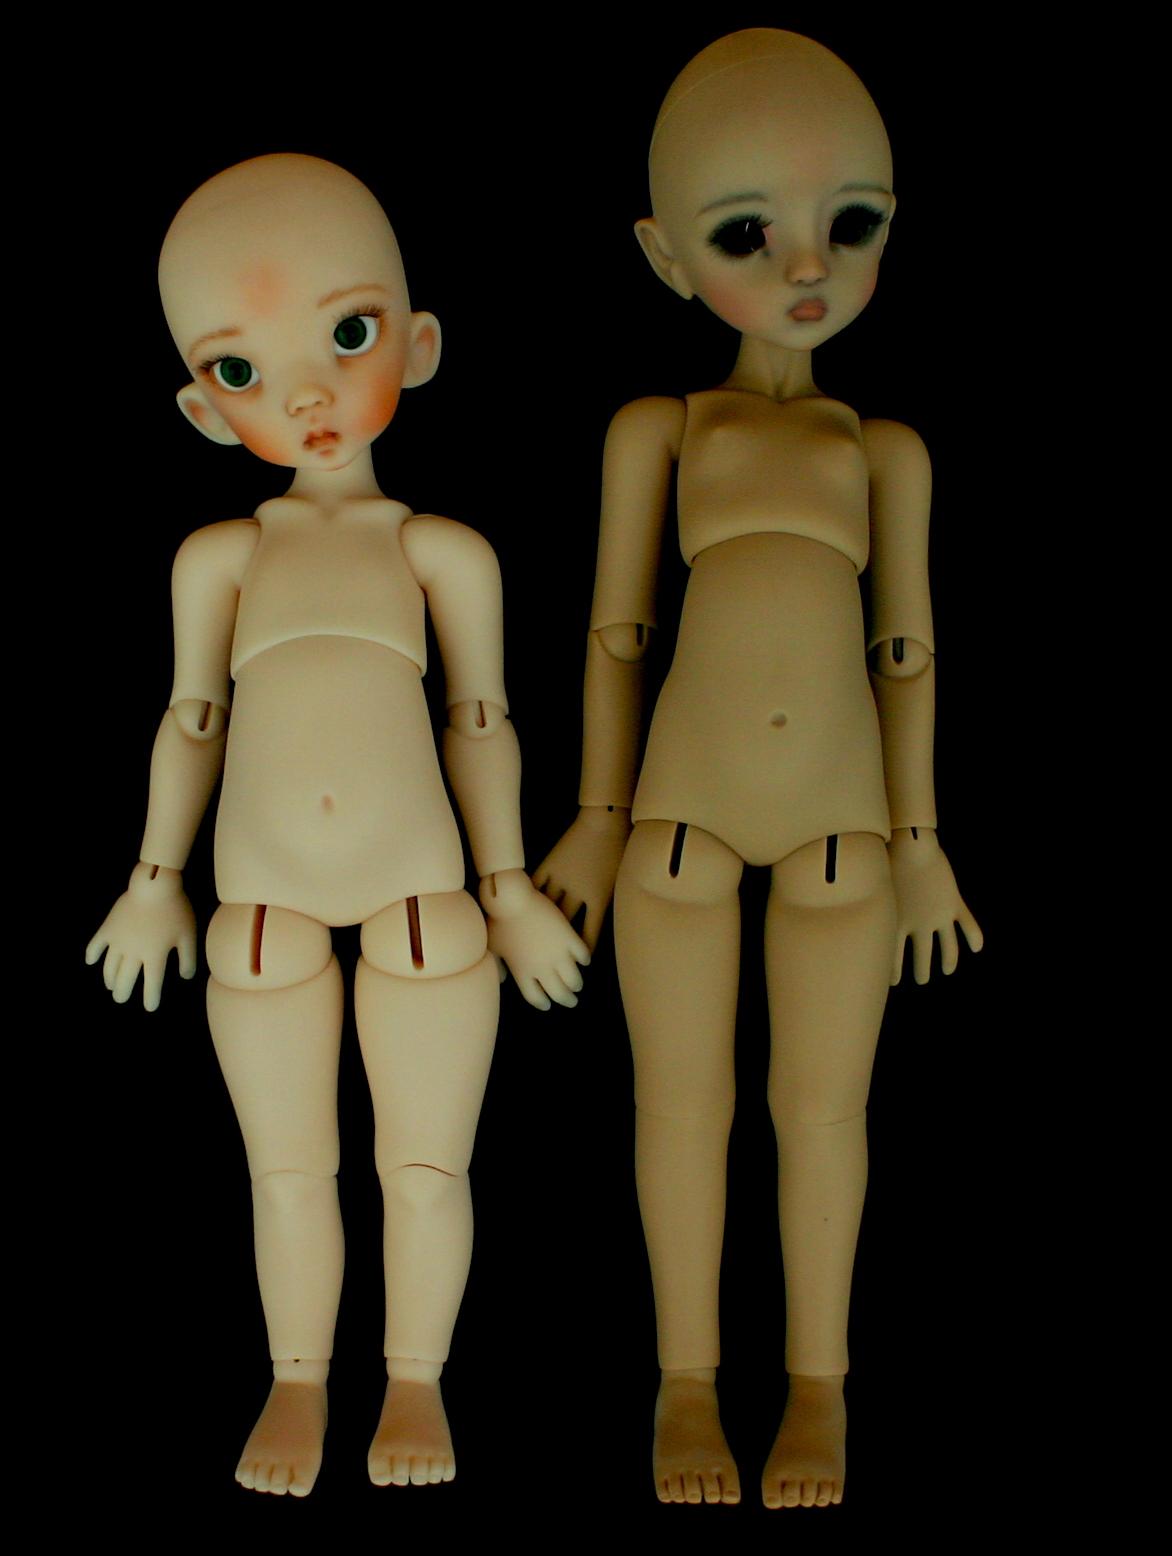 size comparison Linda/Agathe